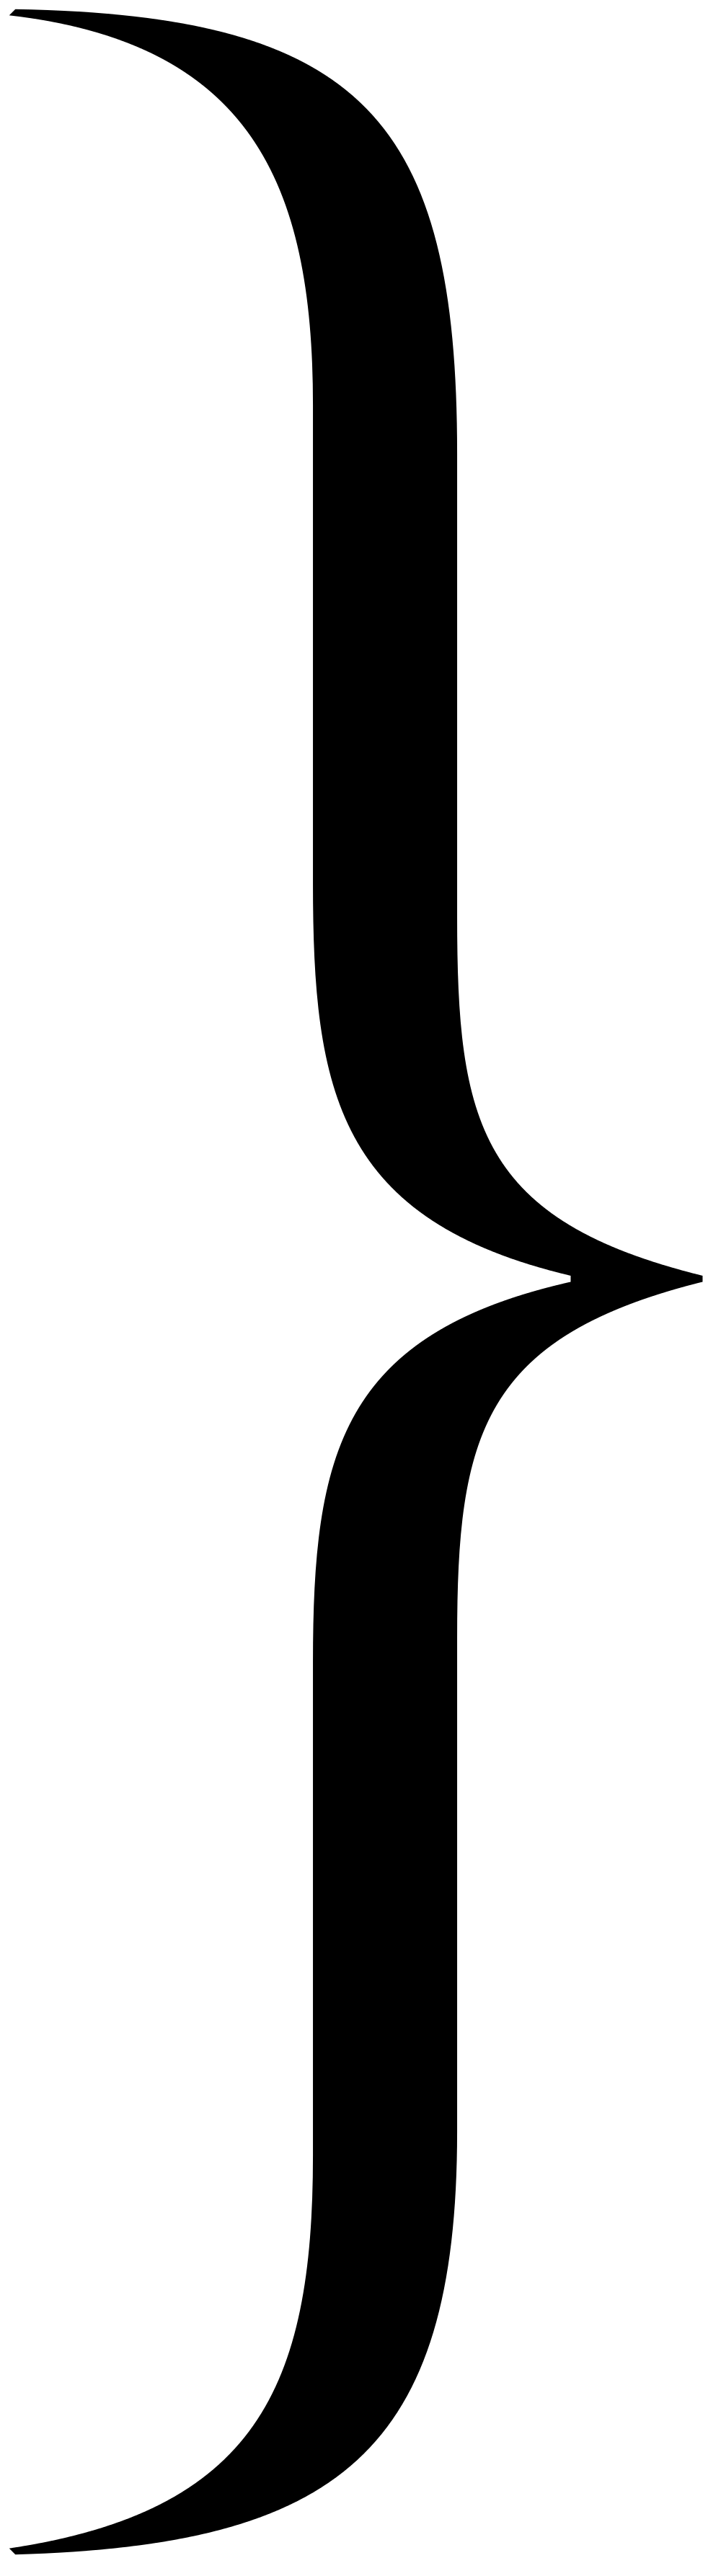 clipart black and white stock bracket vector symbol #110110944